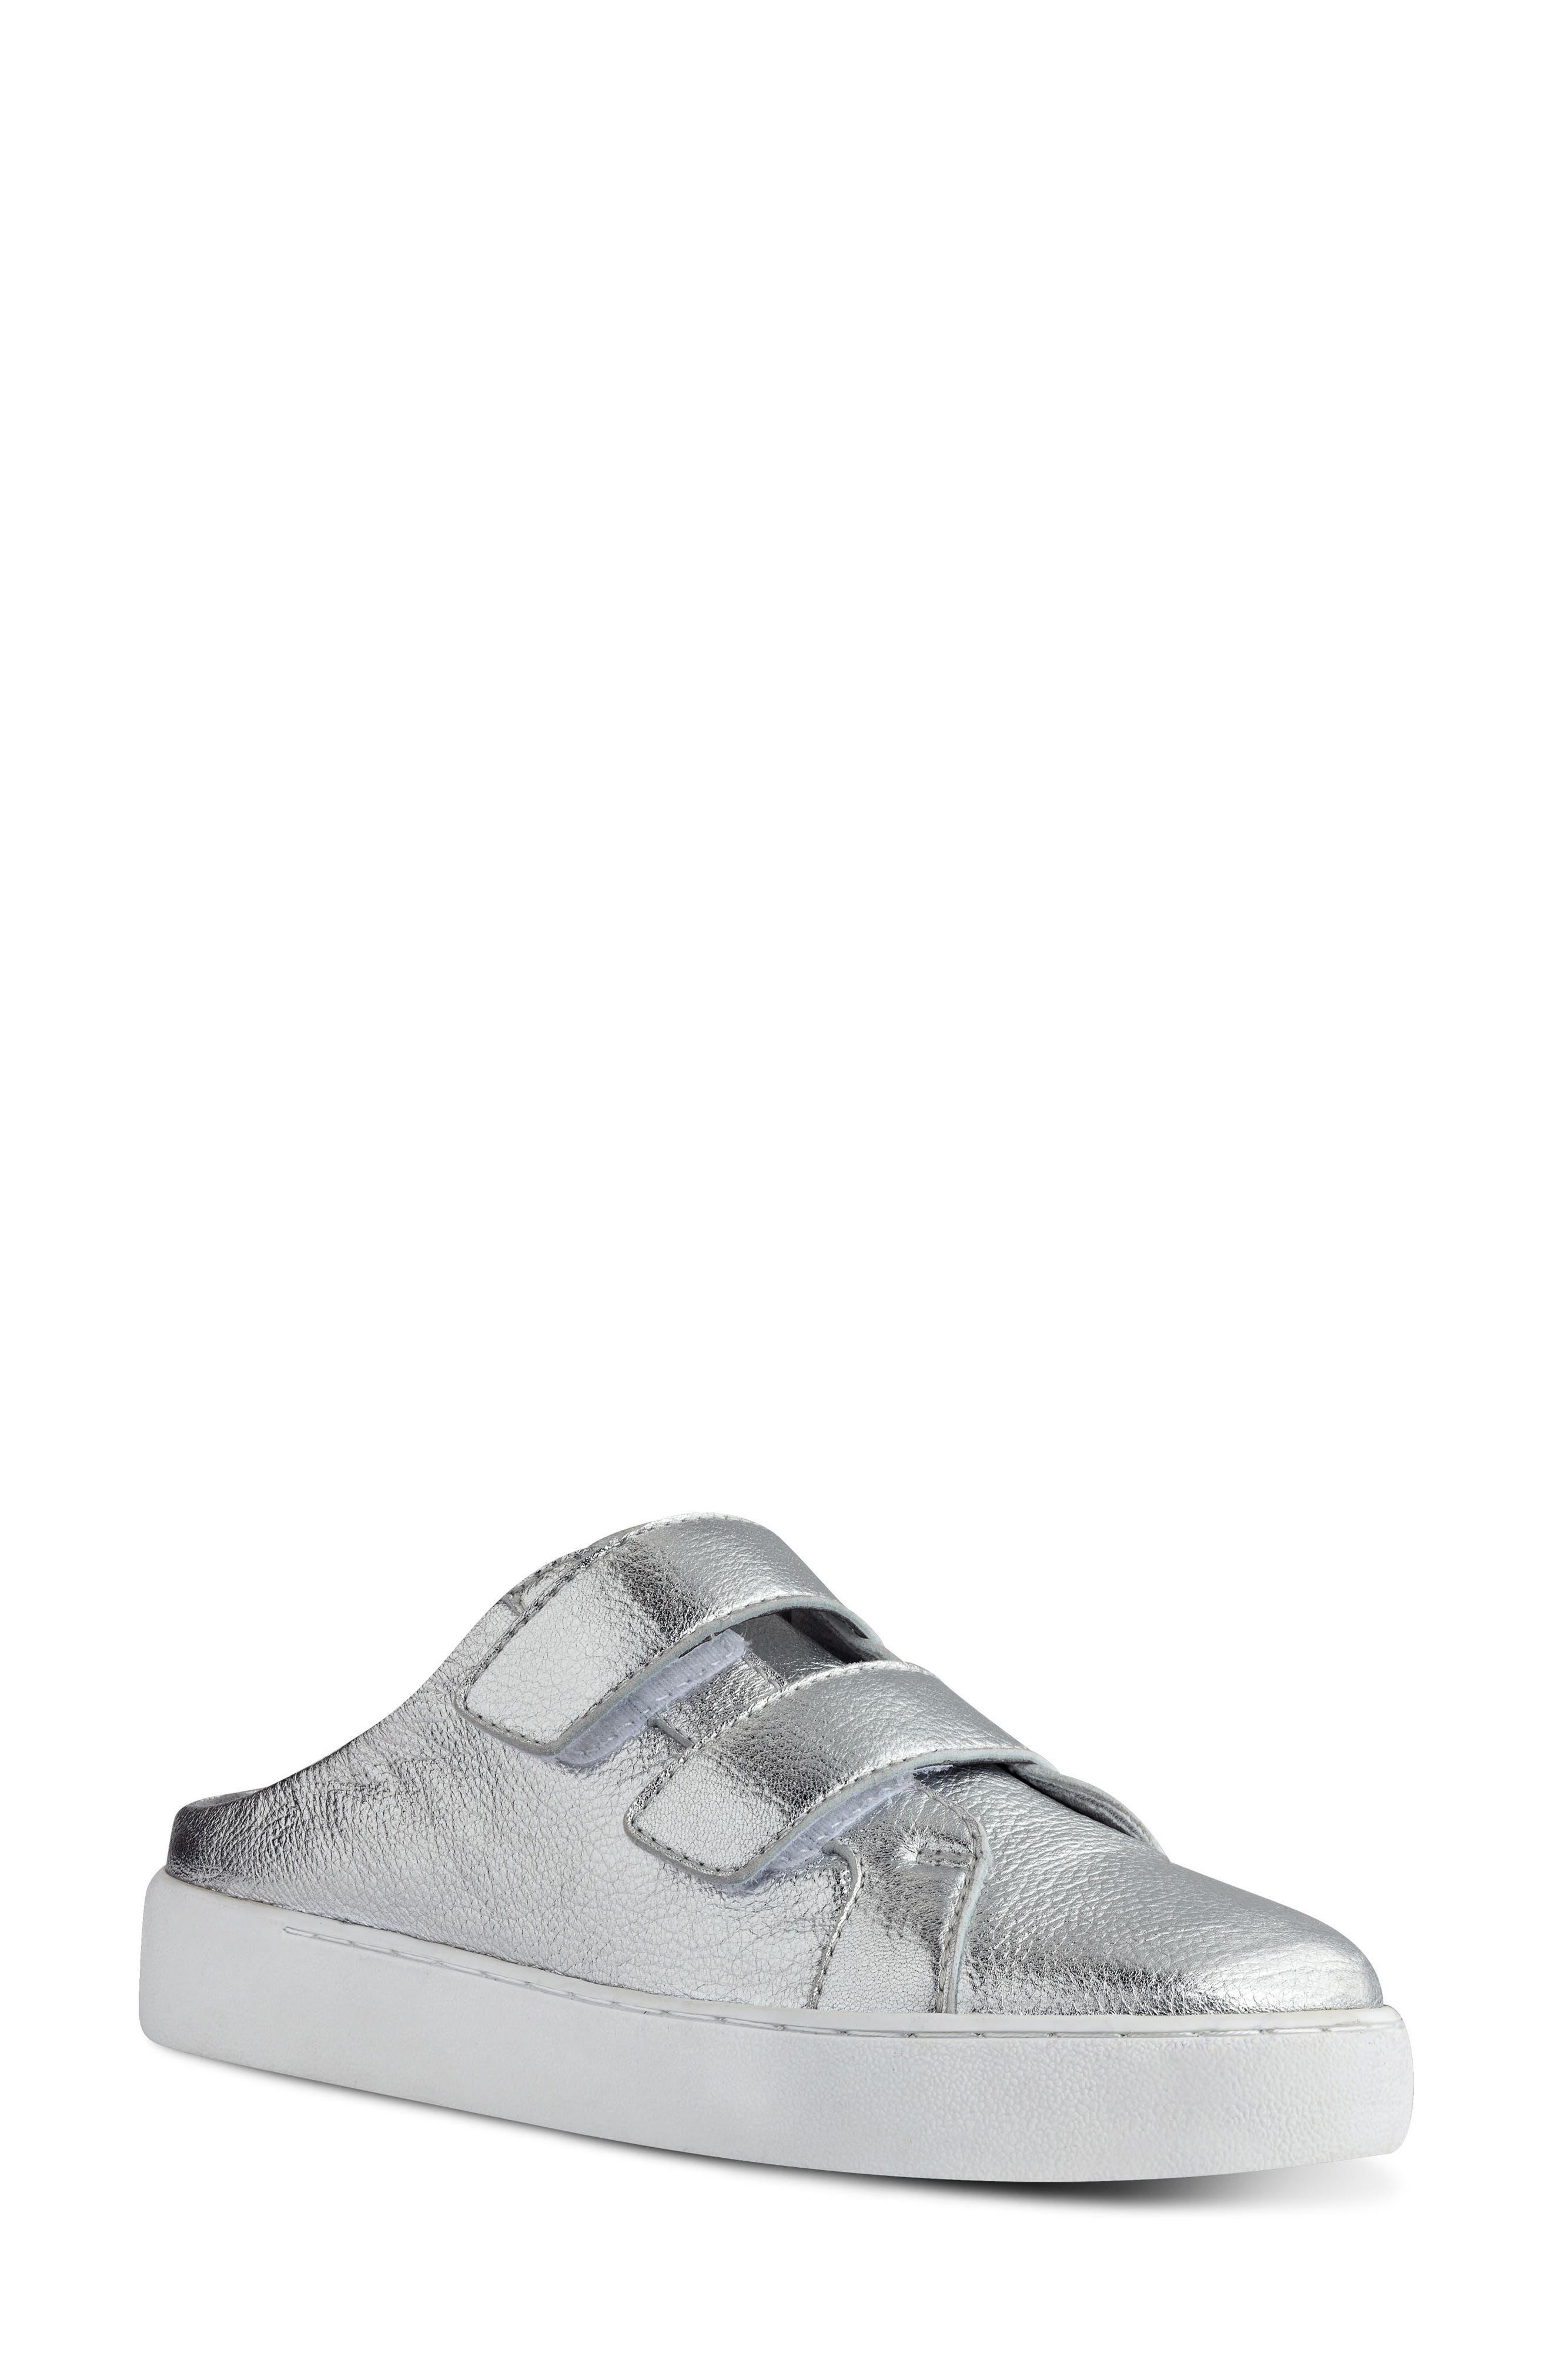 Poeton Sneaker Mule,                             Main thumbnail 1, color,